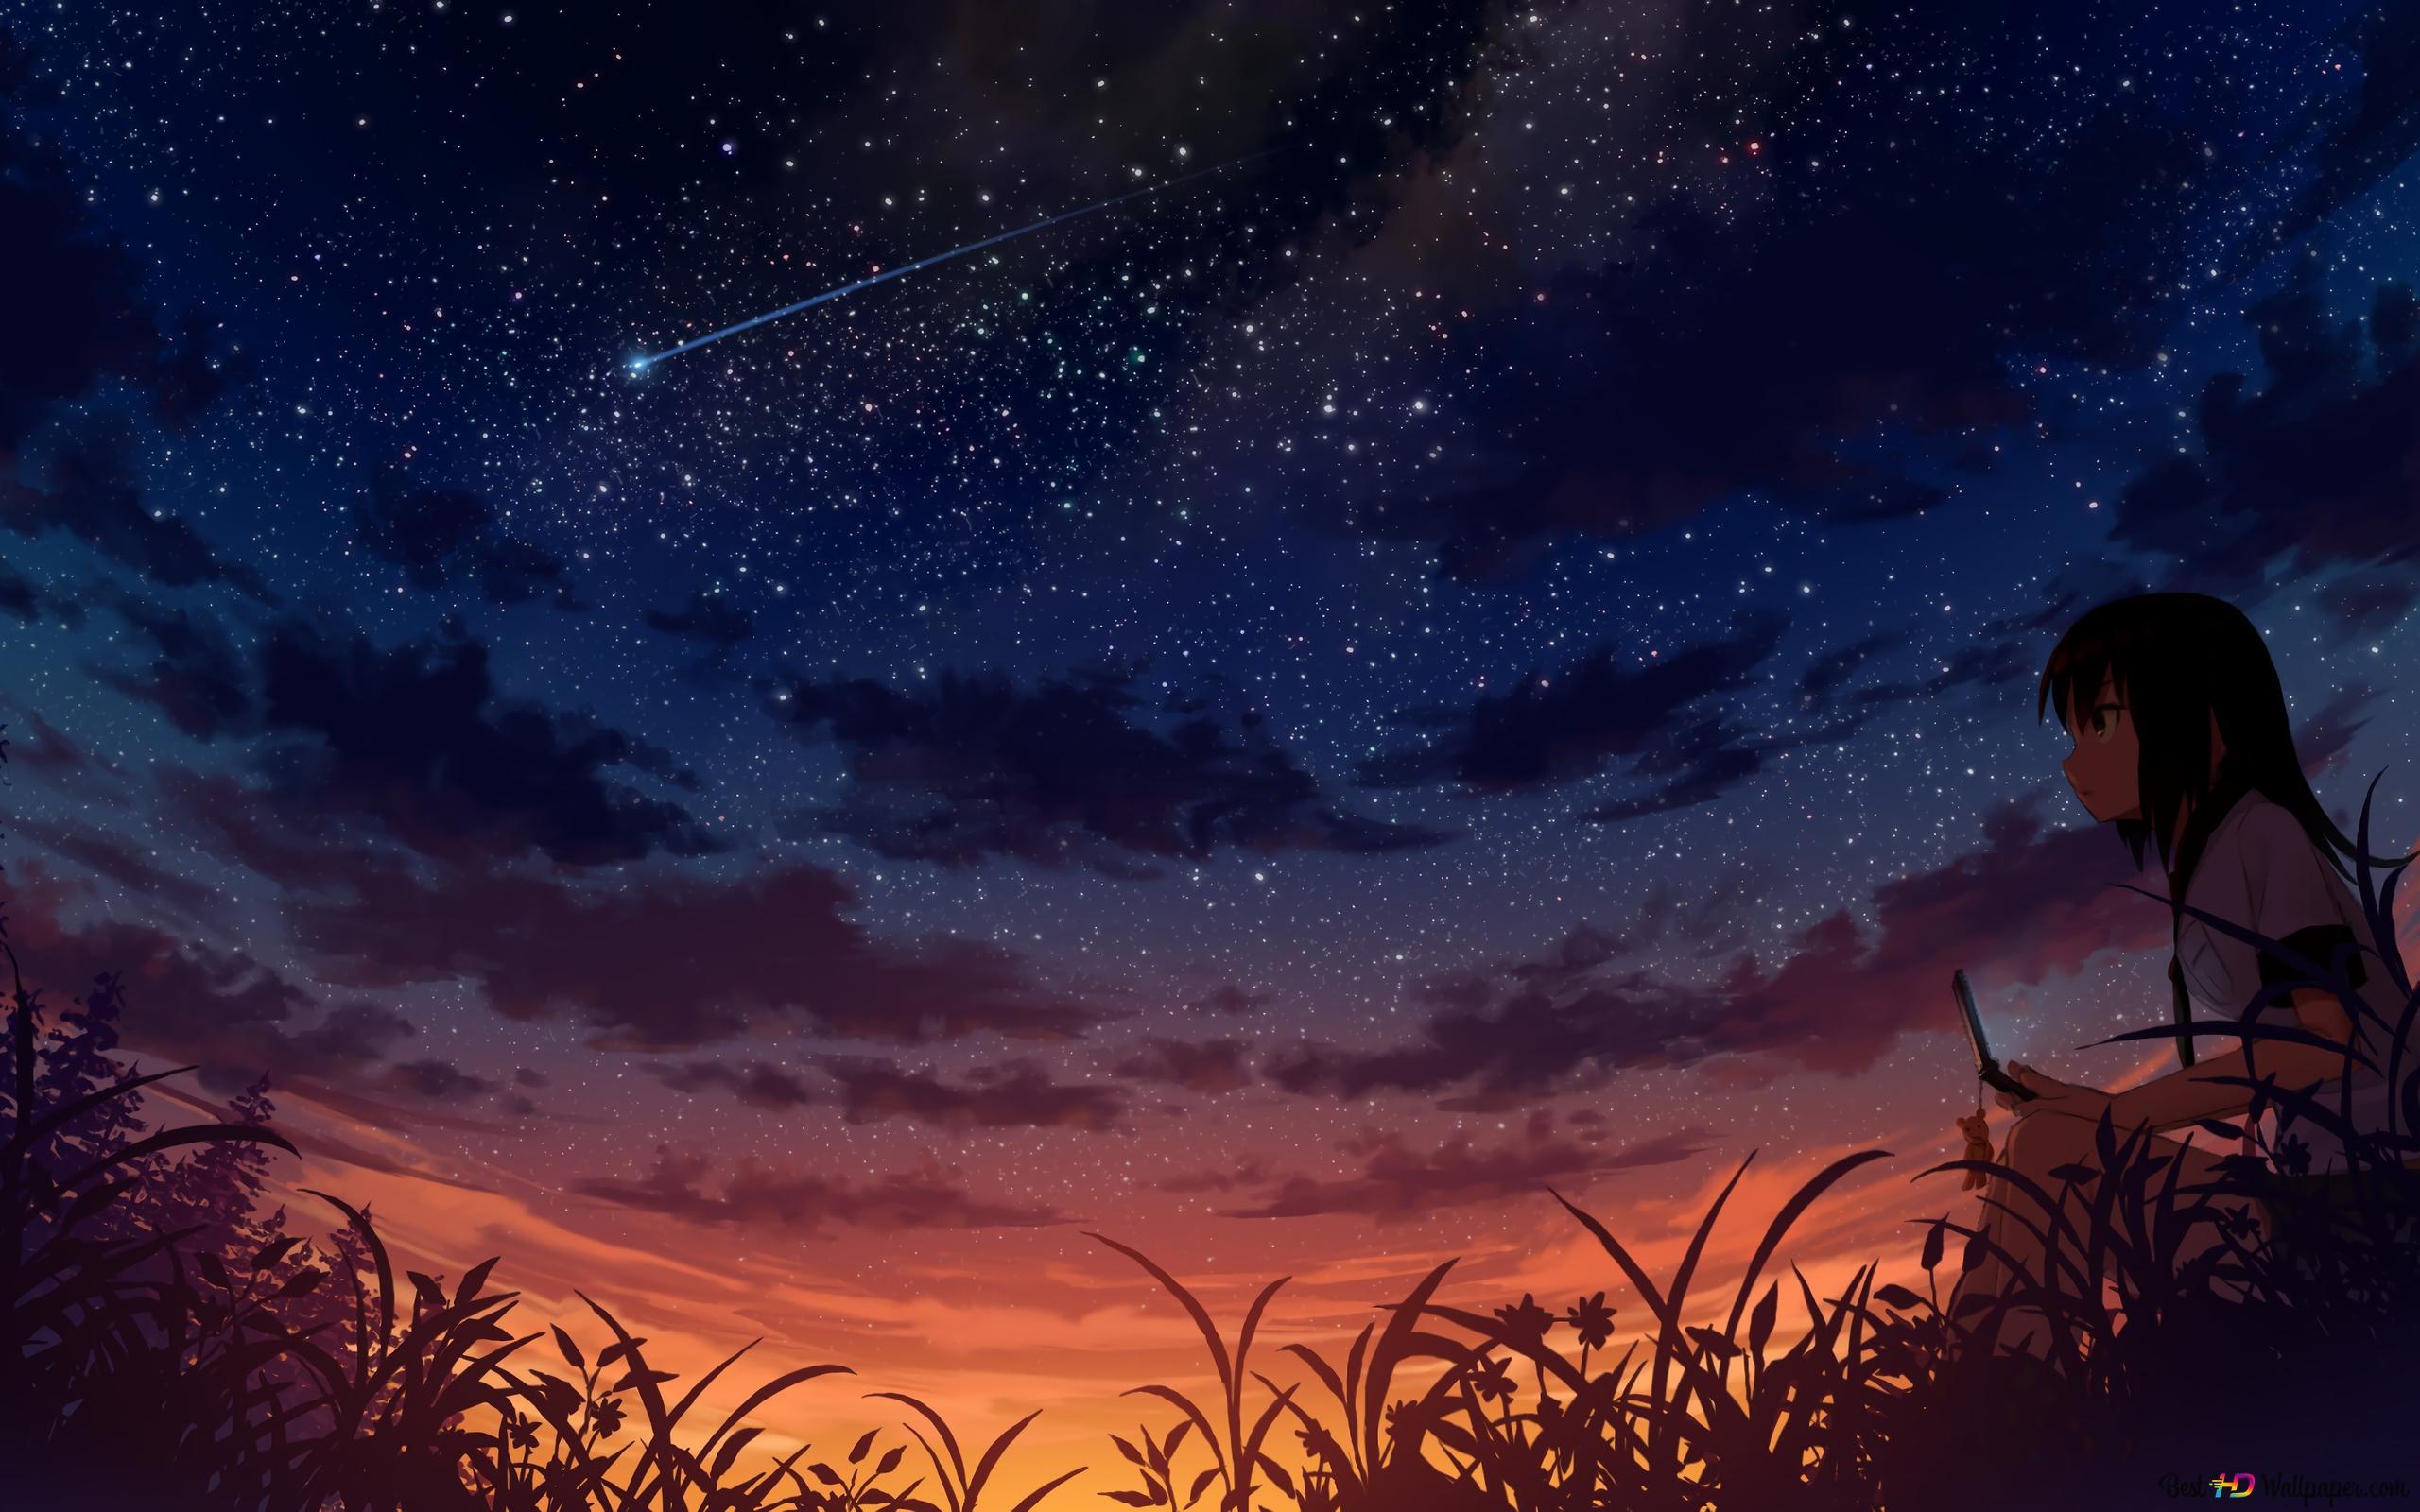 Original Starry Night Hd Wallpaper Download